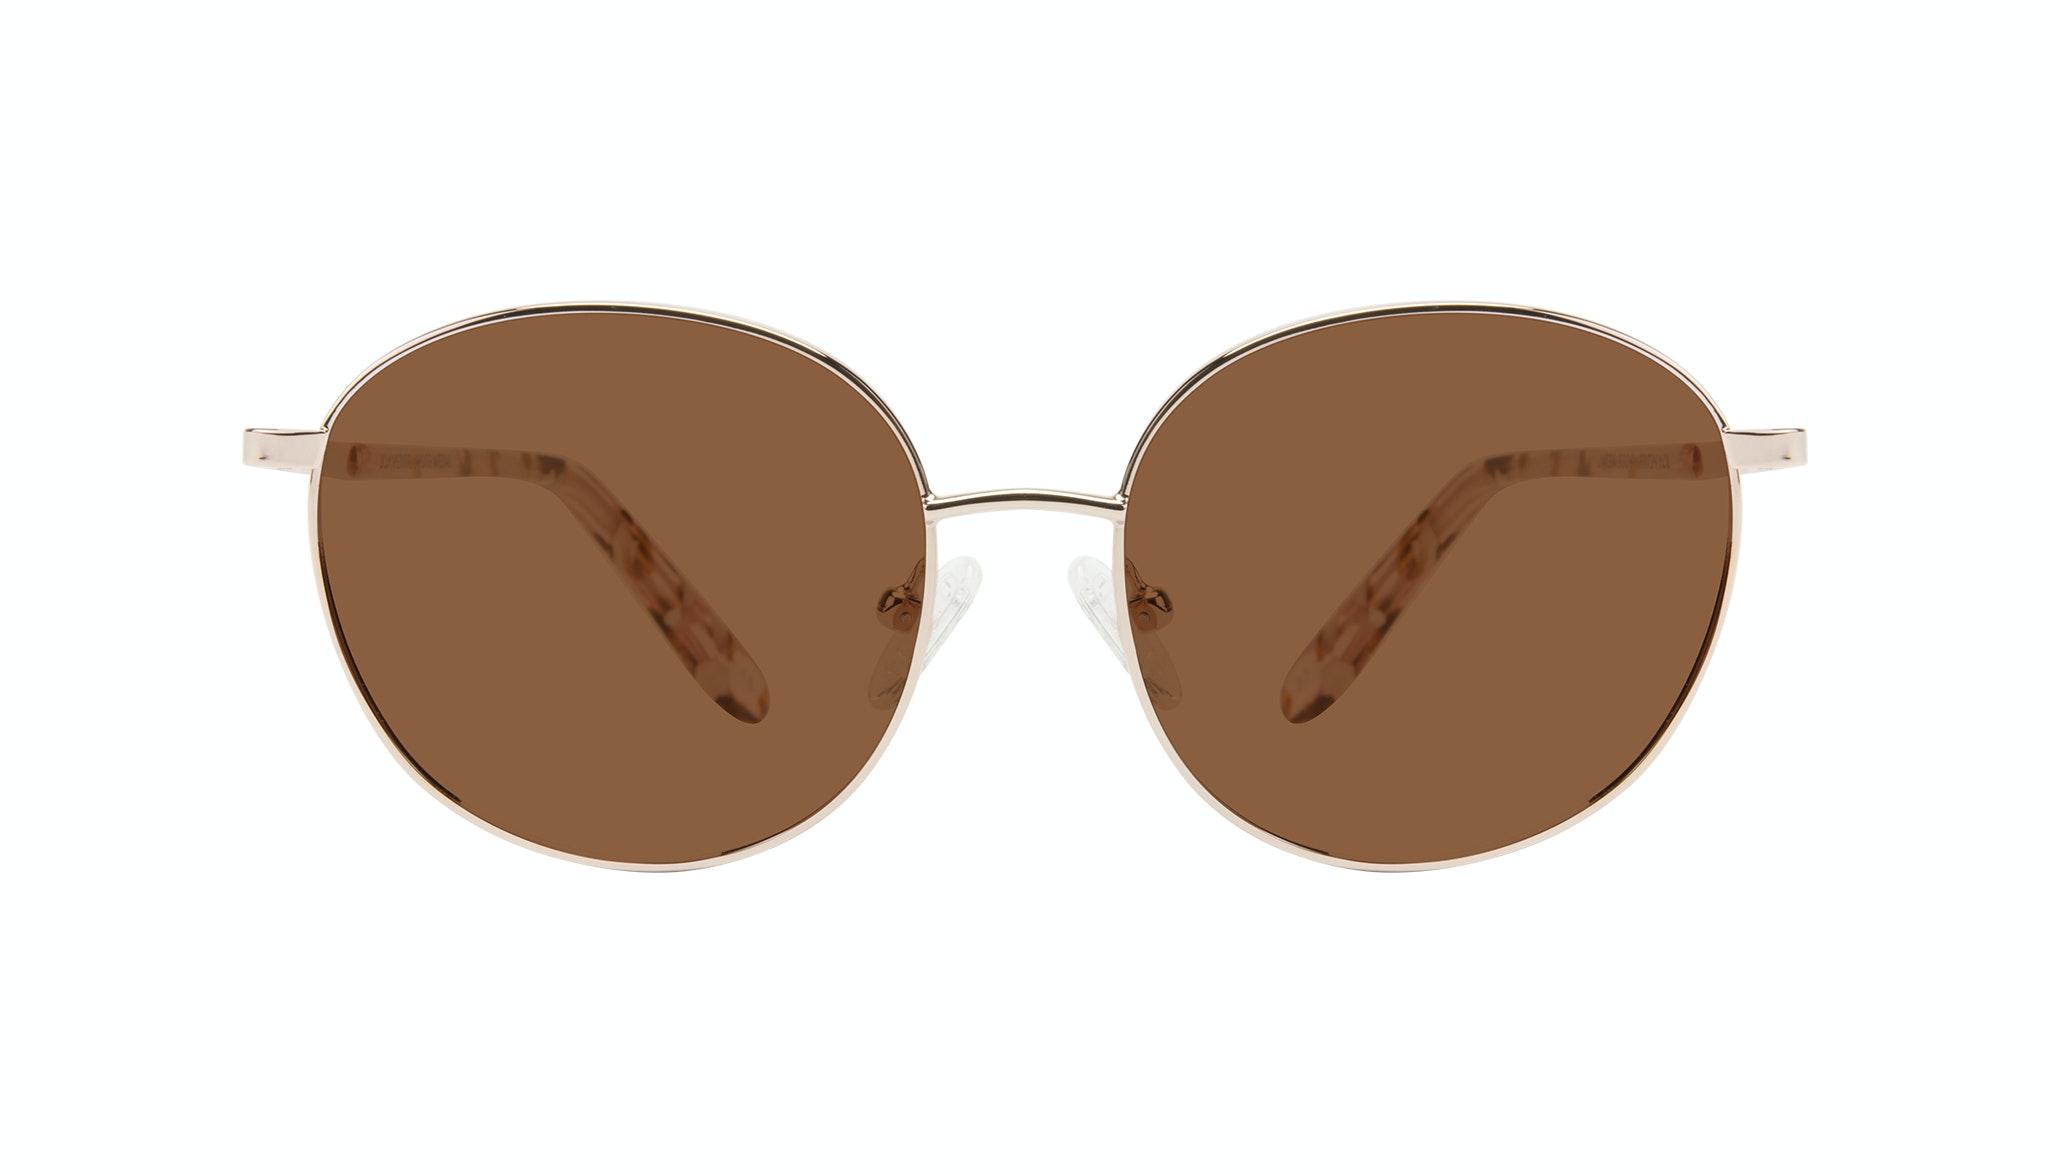 Affordable Fashion Glasses Round Sunglasses Women Joy Petite Rose Metal Front